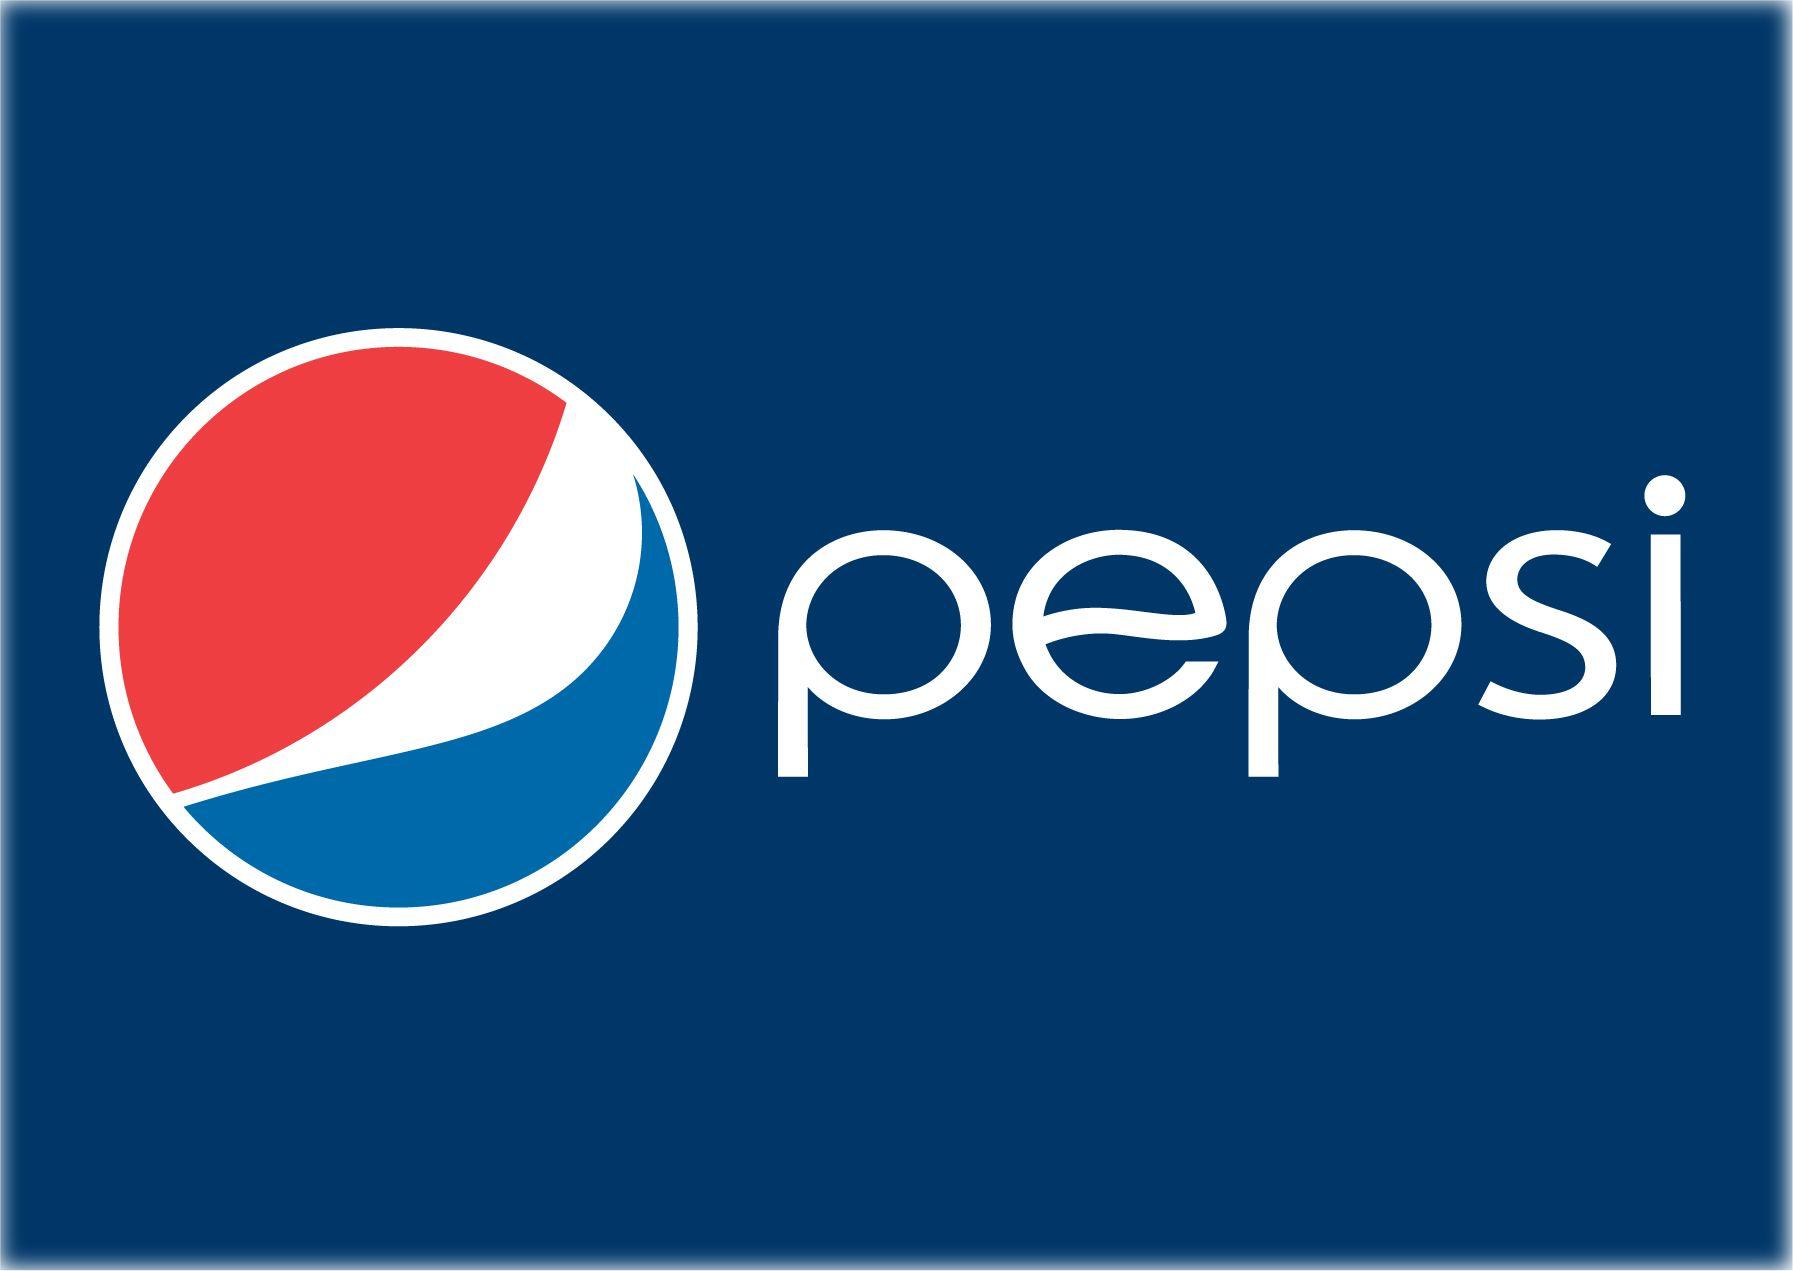 Image result for pepsi logo